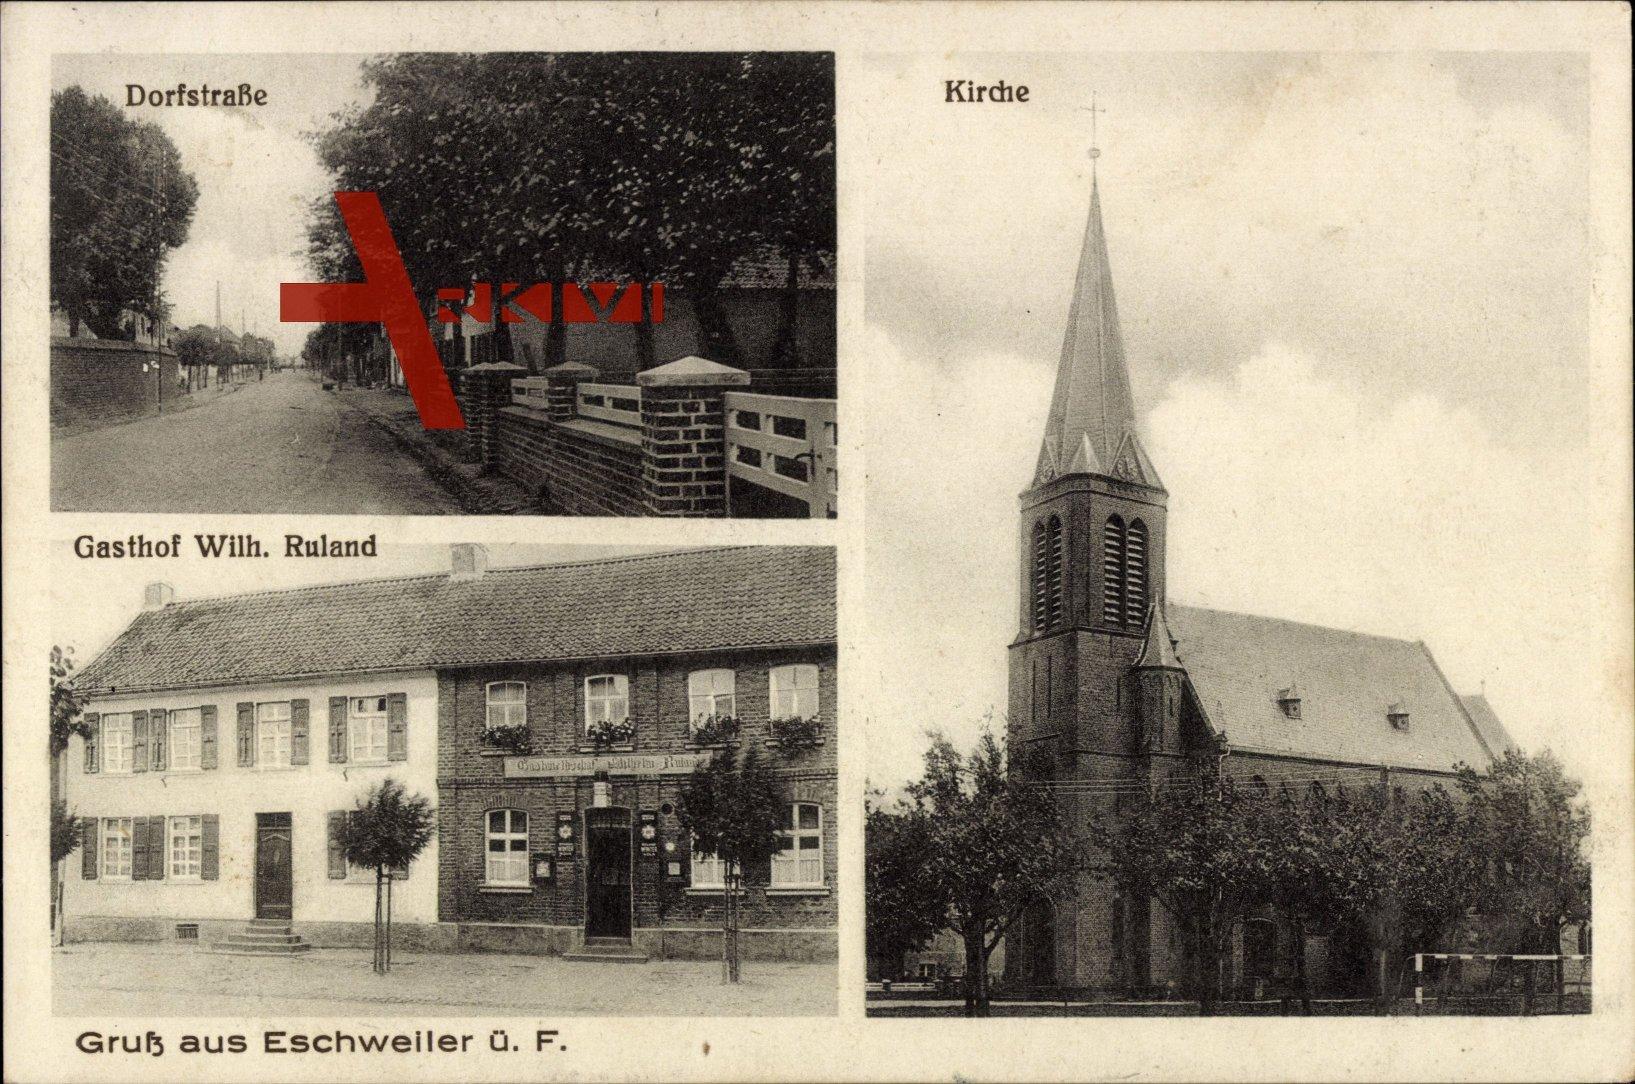 Eschweiler bei Nörvenich Kreis Düren, Dorfstraße, Kirche, Gasthaus Wilh. Ruland